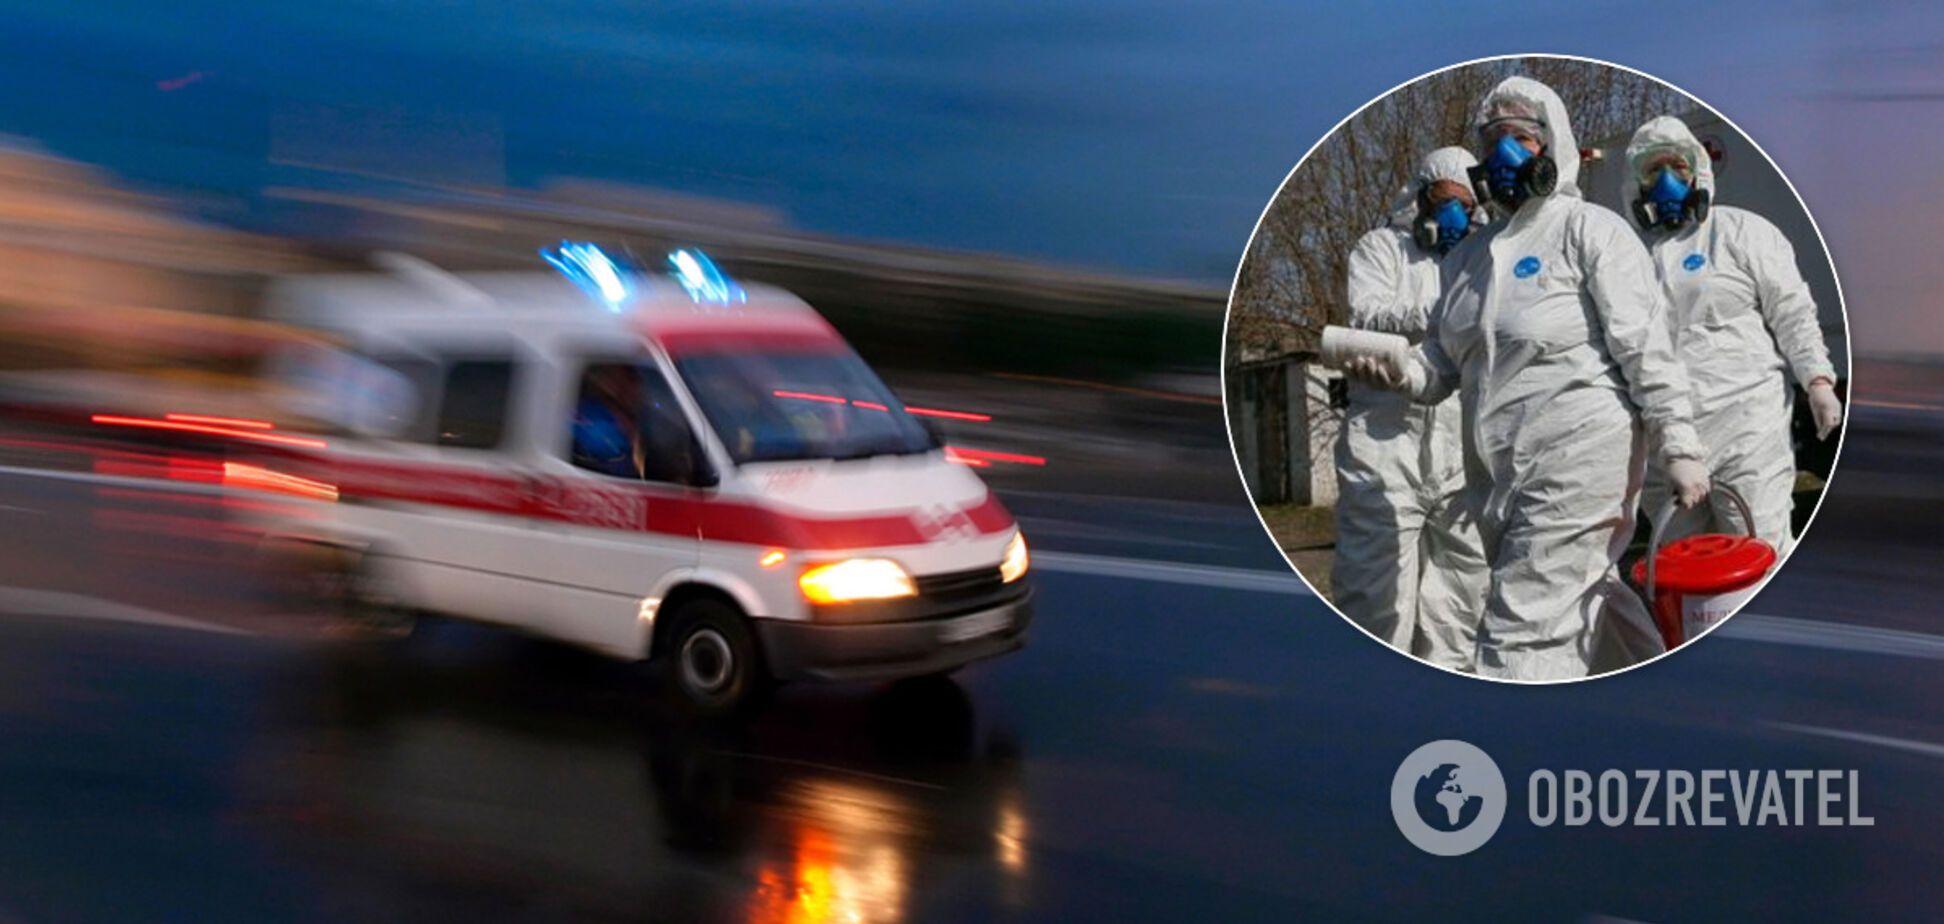 Плюс 175 за сутки! Количество заболевших коронавирусом в Украине перешло за тысячу